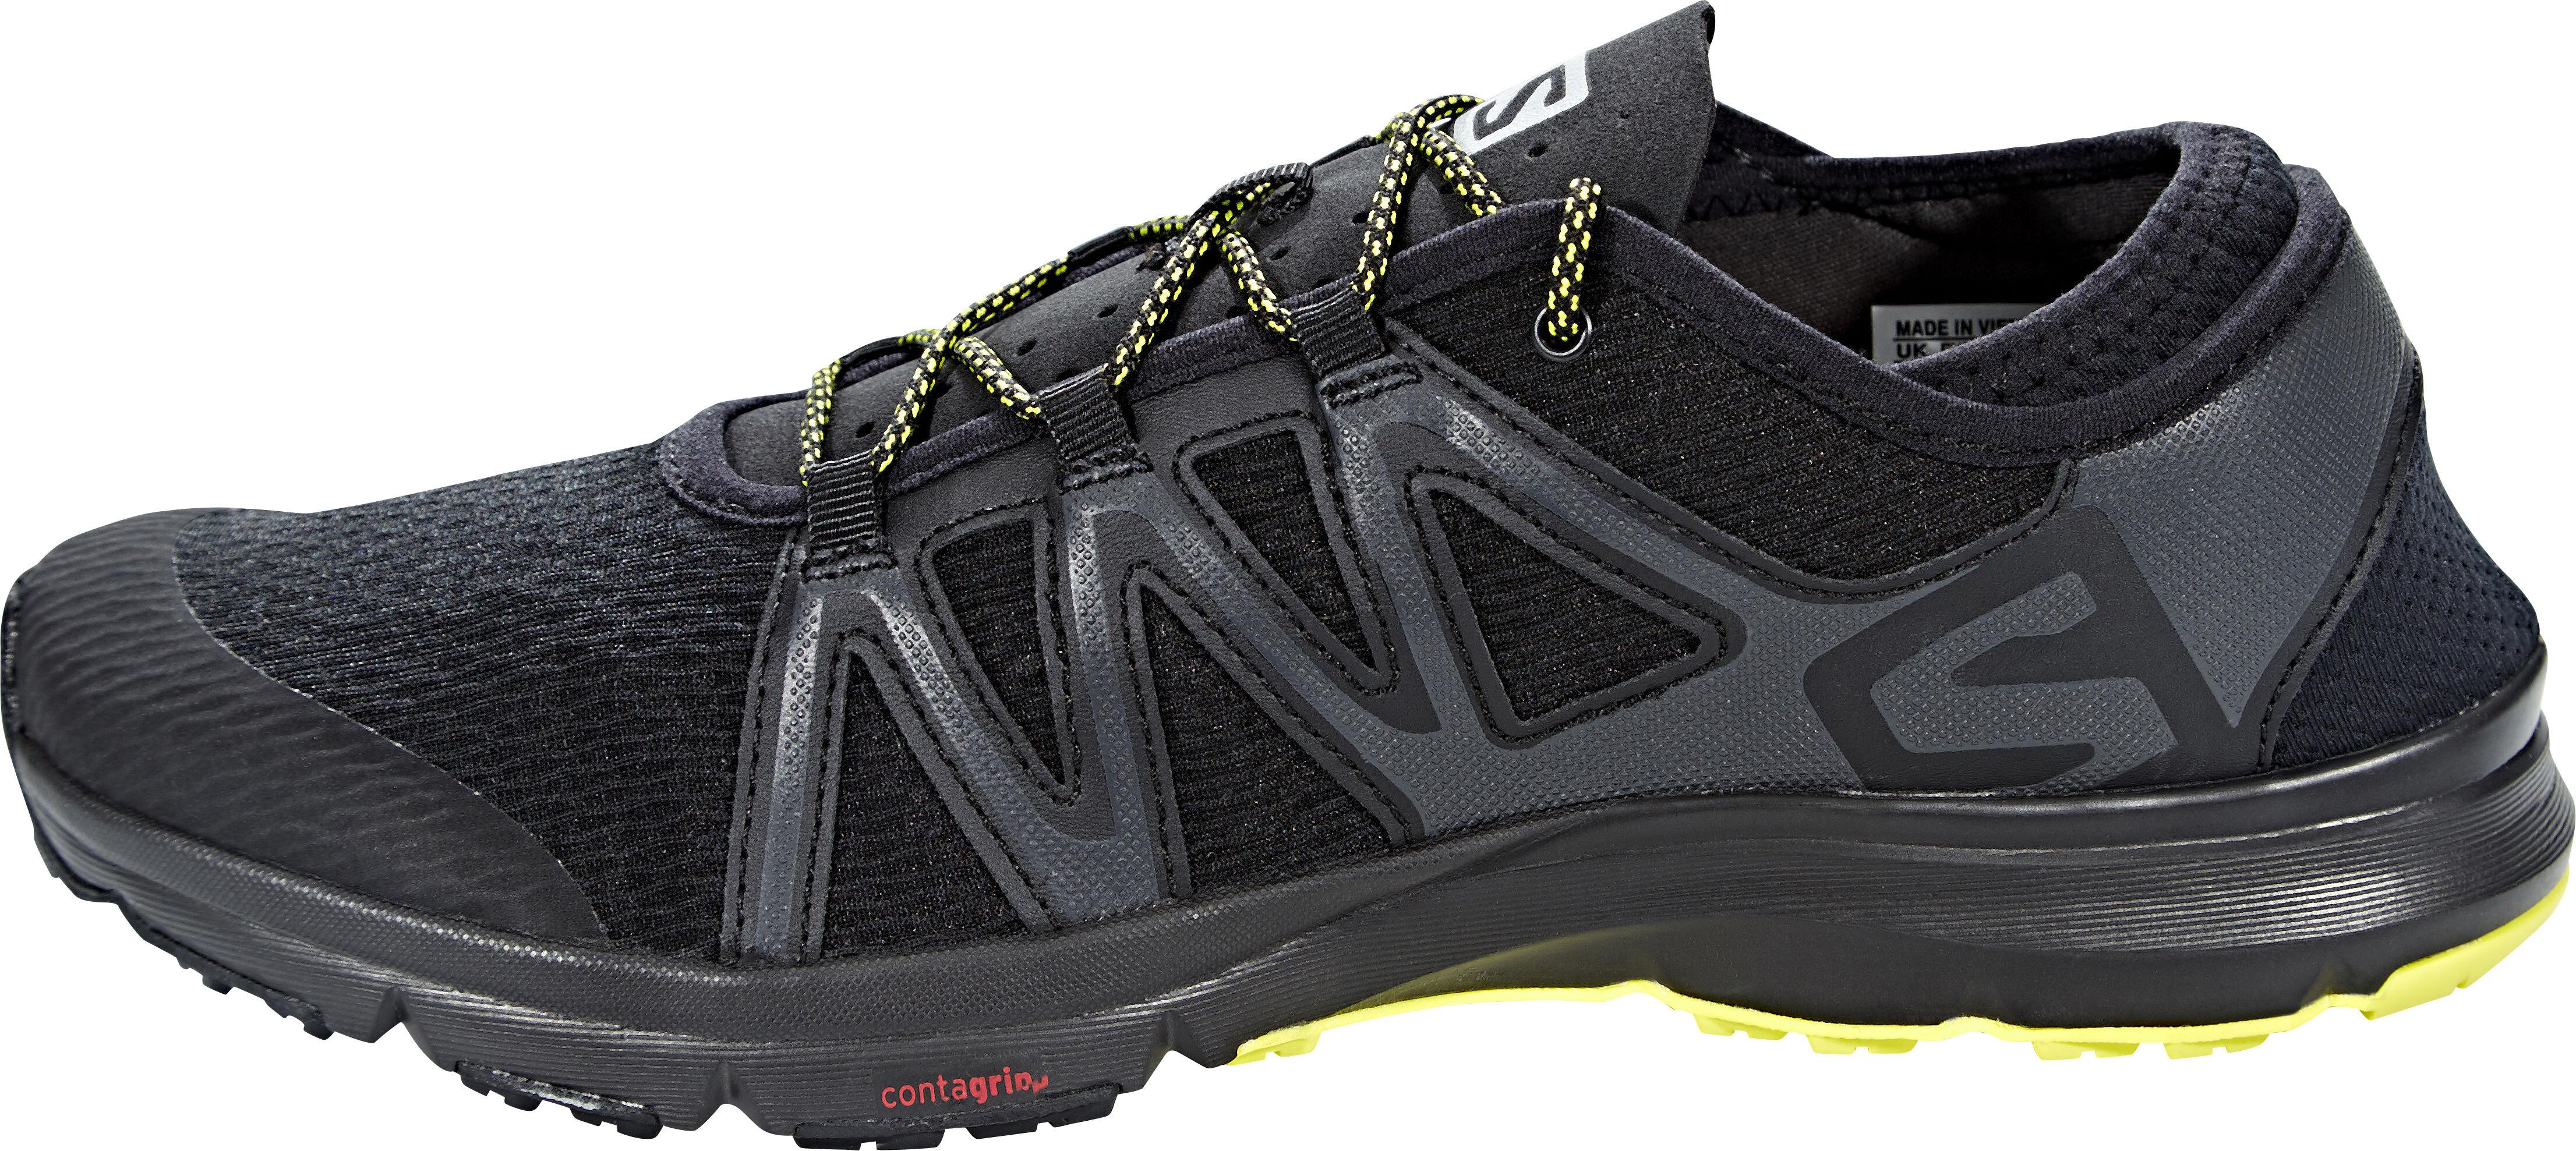 40fe8d3a6675f Salomon Crossamphibian Swift Shoes Men black at Addnature.co.uk